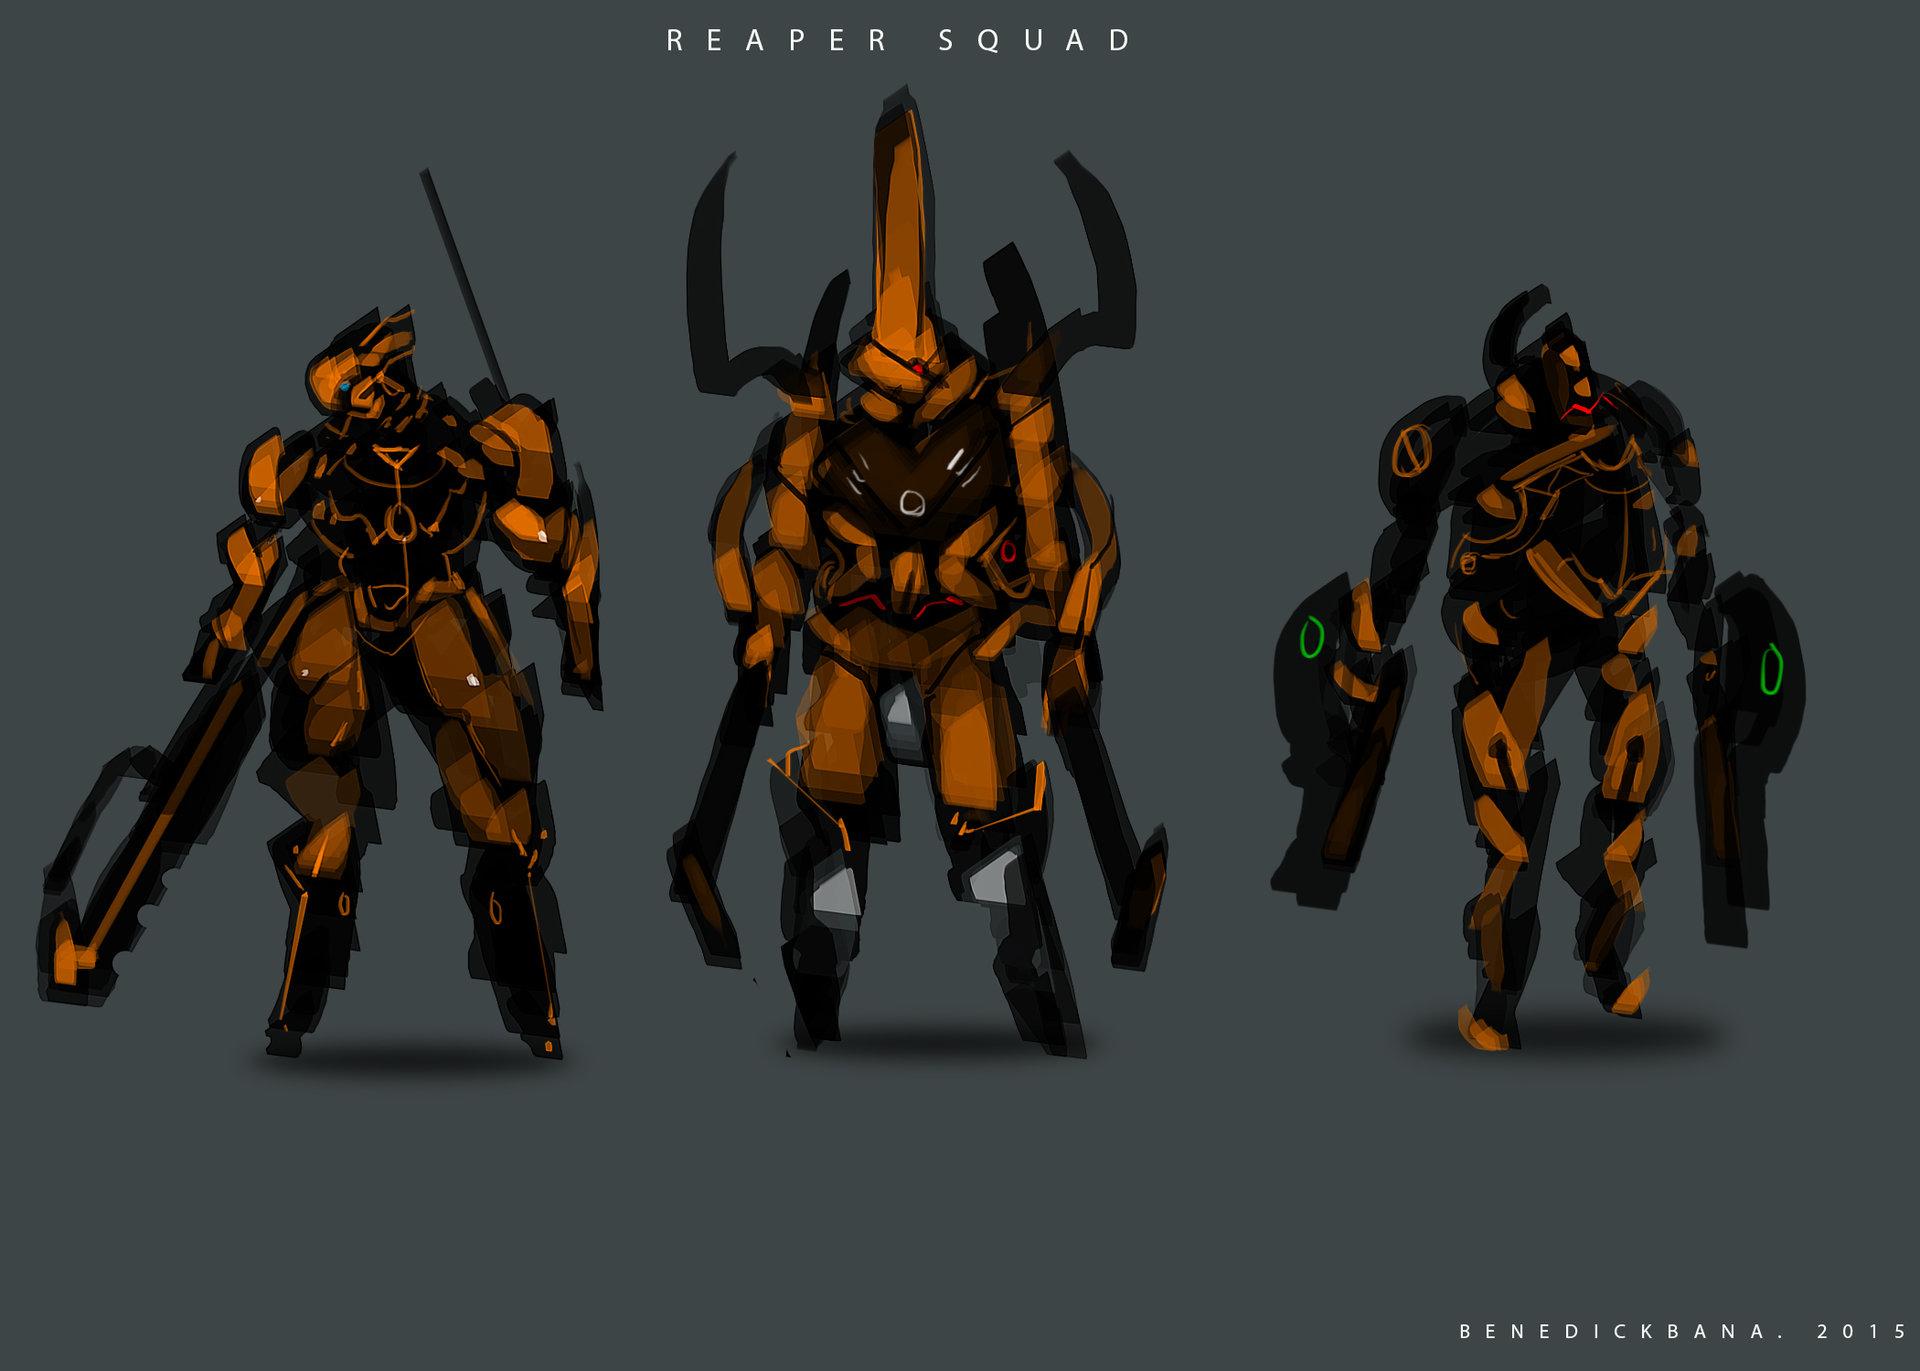 Benedick bana reaper squad